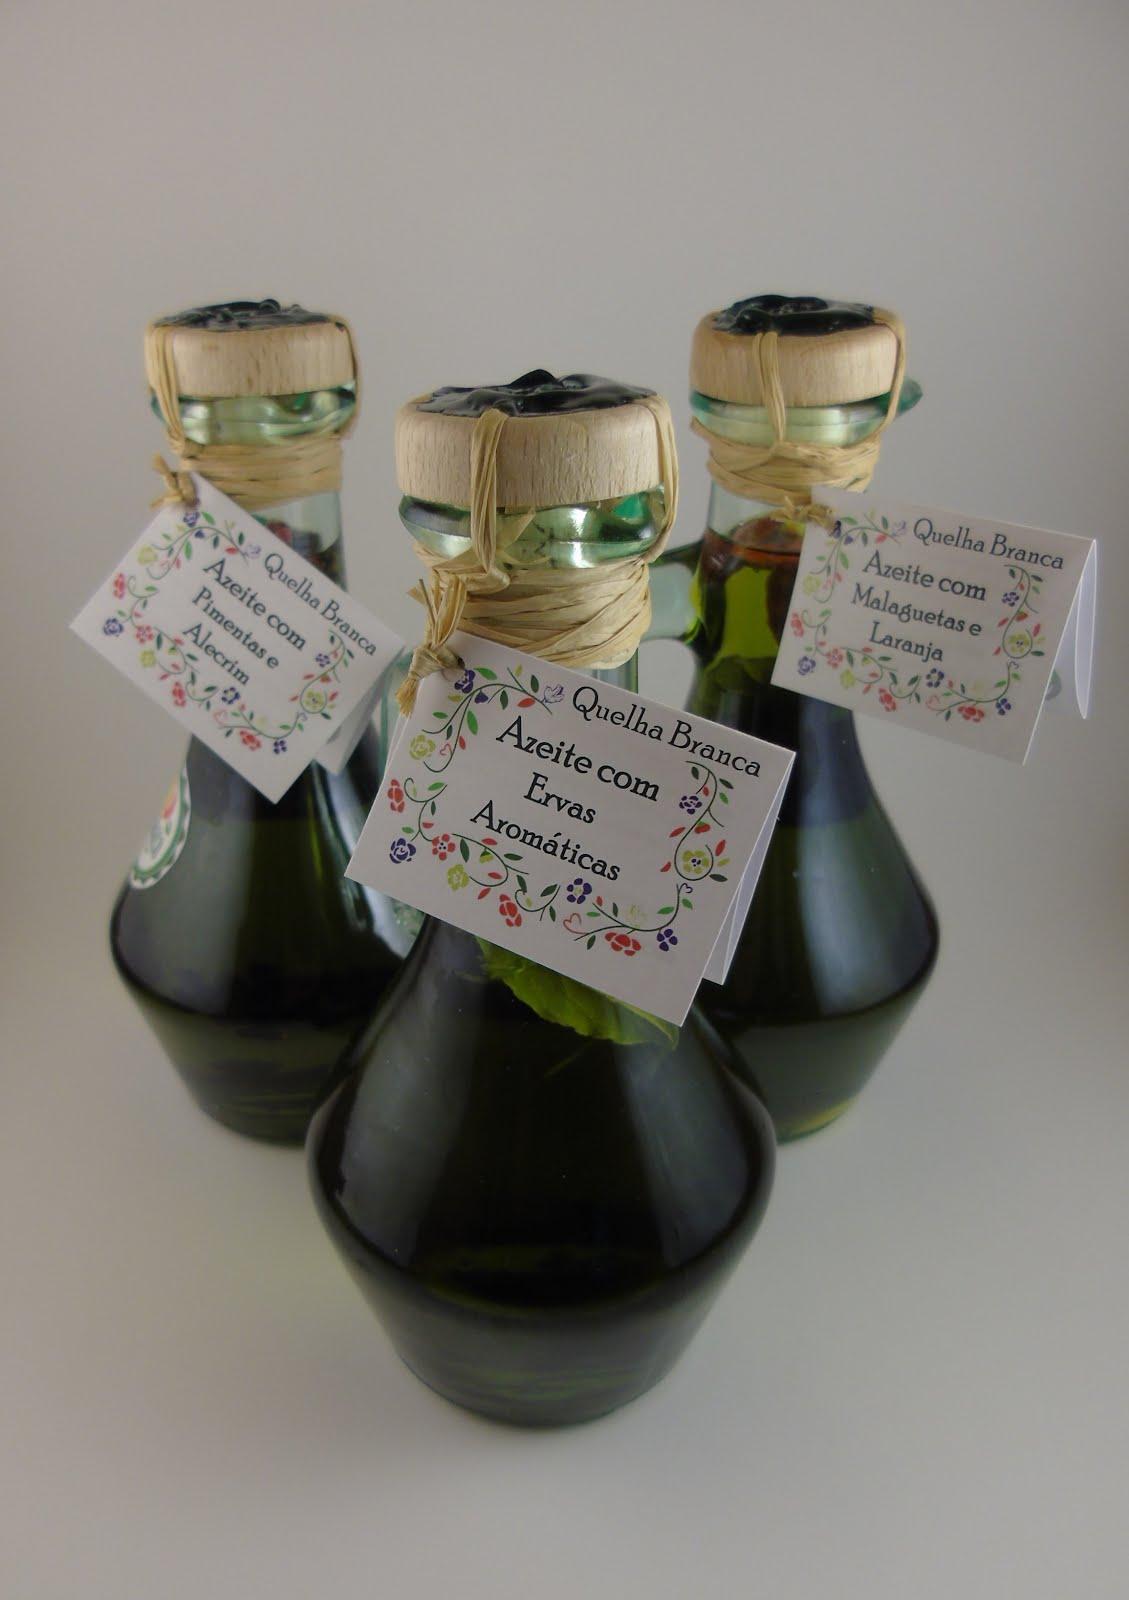 Azeite e Vinagre de Aromas